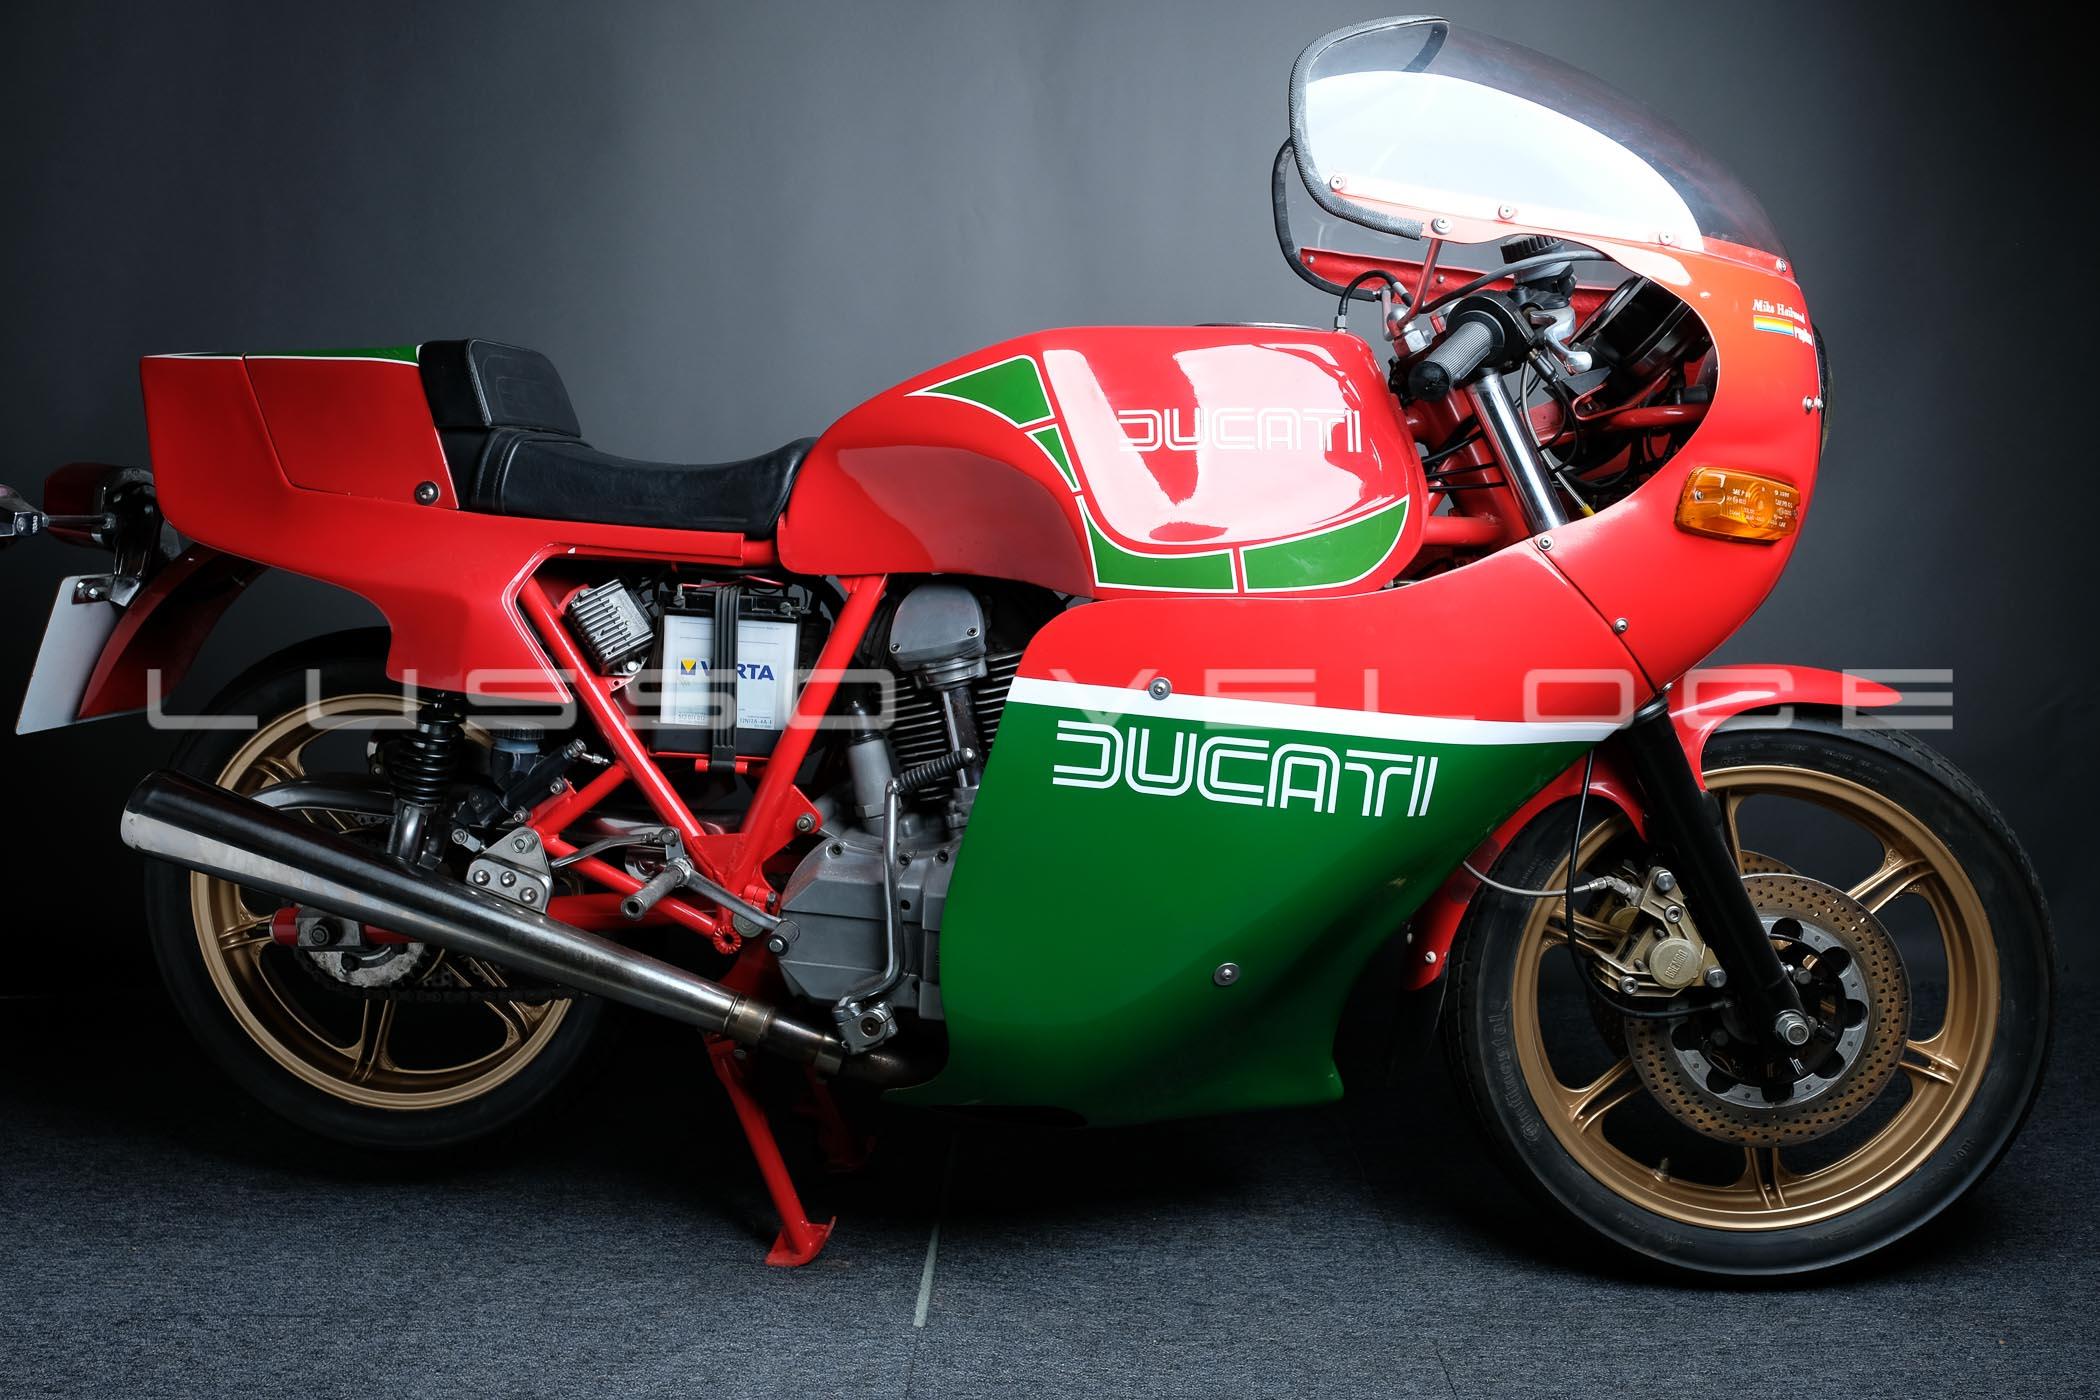 Ducati 900SS Bevel MHR